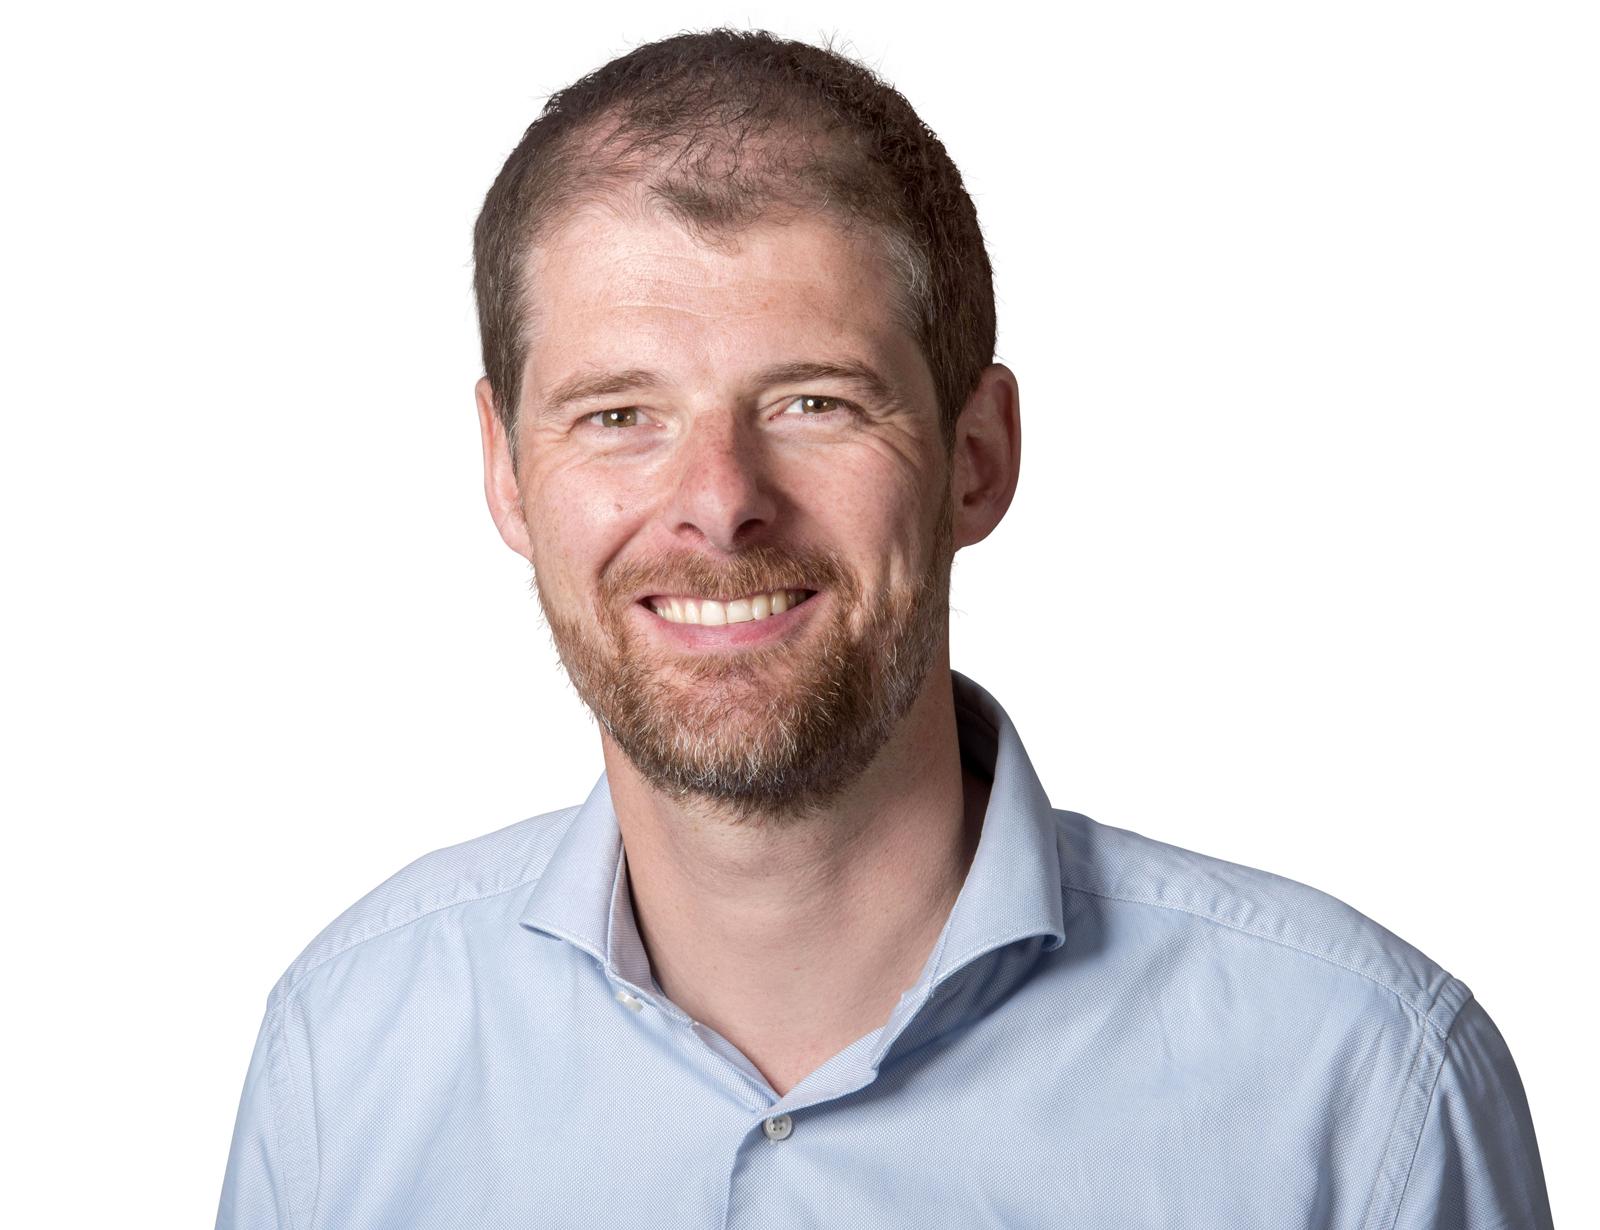 Paul van der Krogt